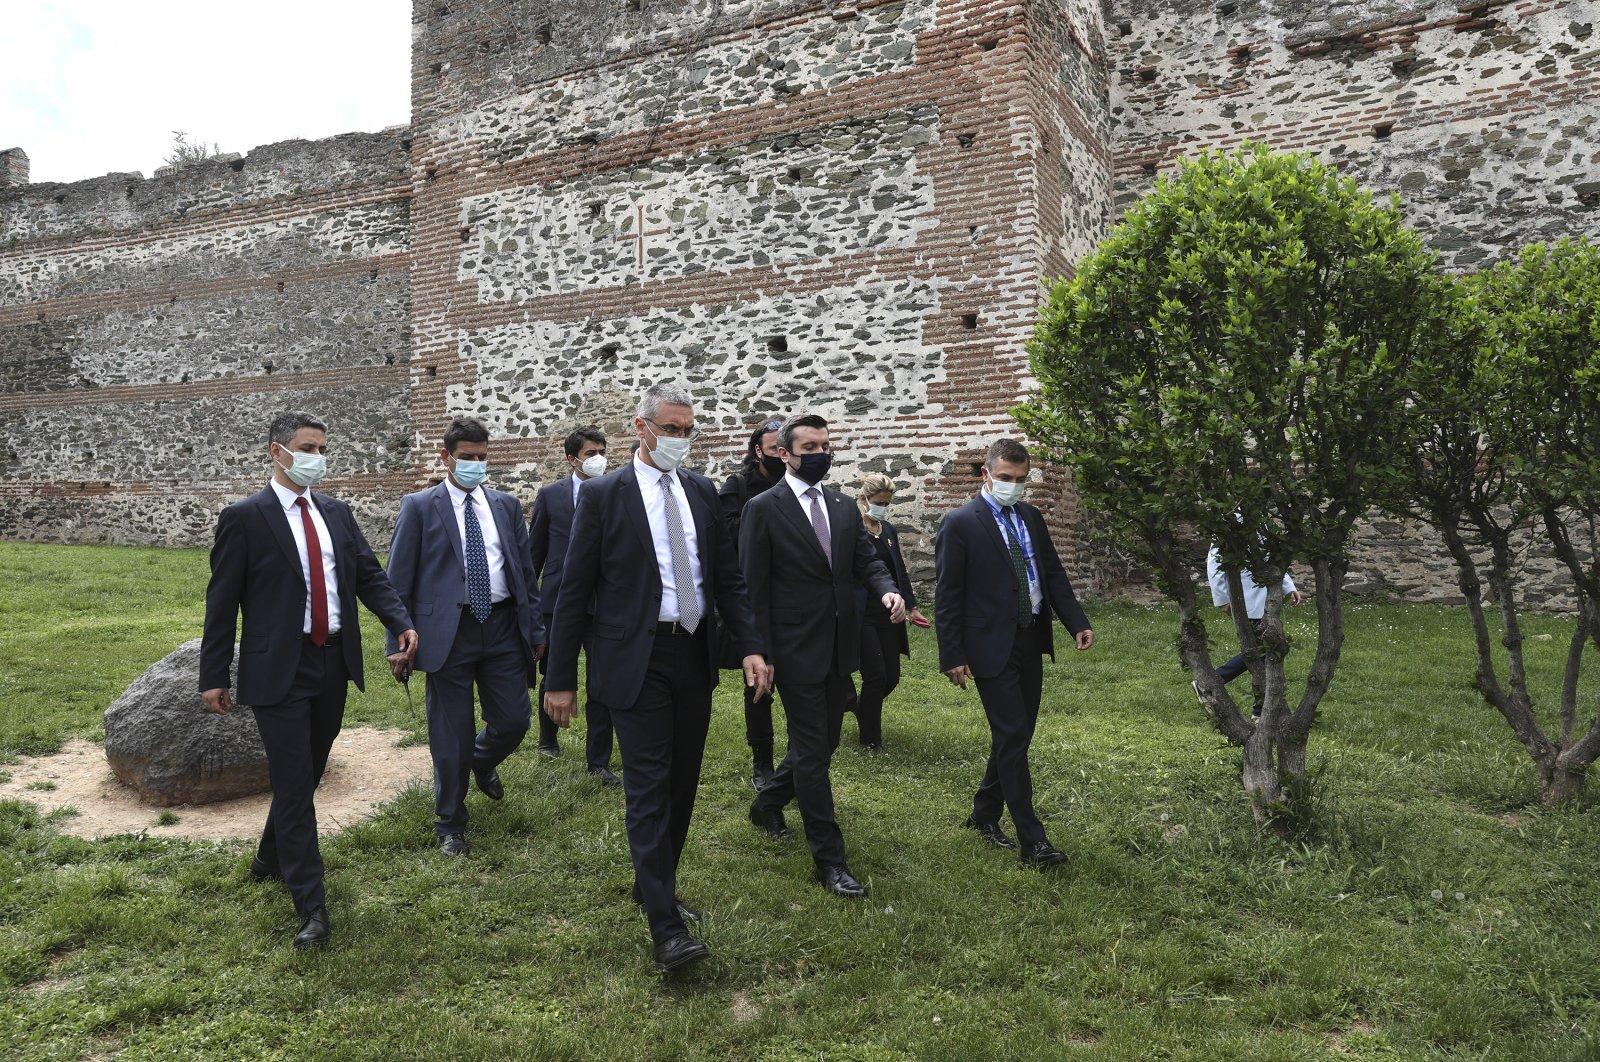 Deputy Foreign Minister Yavuz Selim Kıran (C) visits the Hamidiye Mosque in Thessaloniki, Greece, May 5, 2021. (AA Photo)